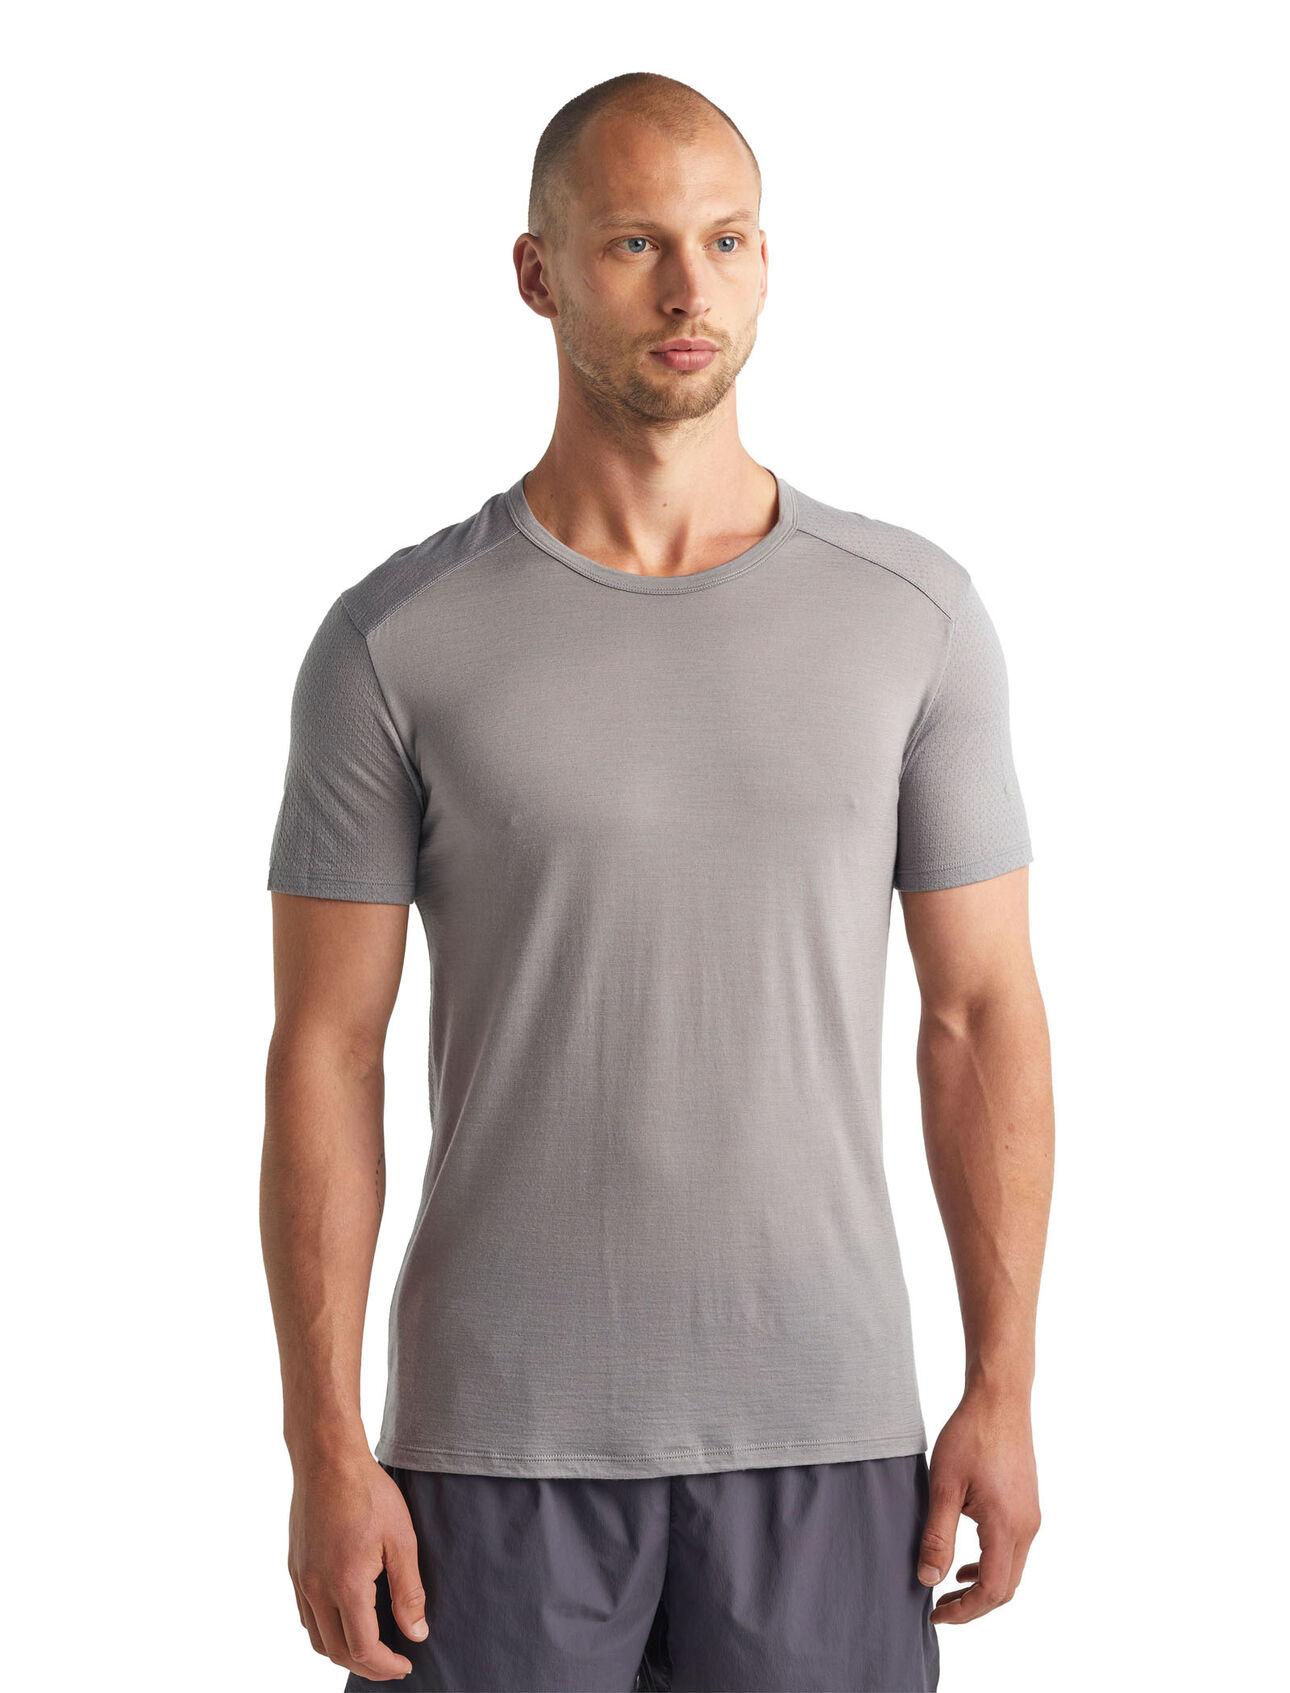 Cool-Lite™ Merino Amplify kurzärmliges T-Shirt